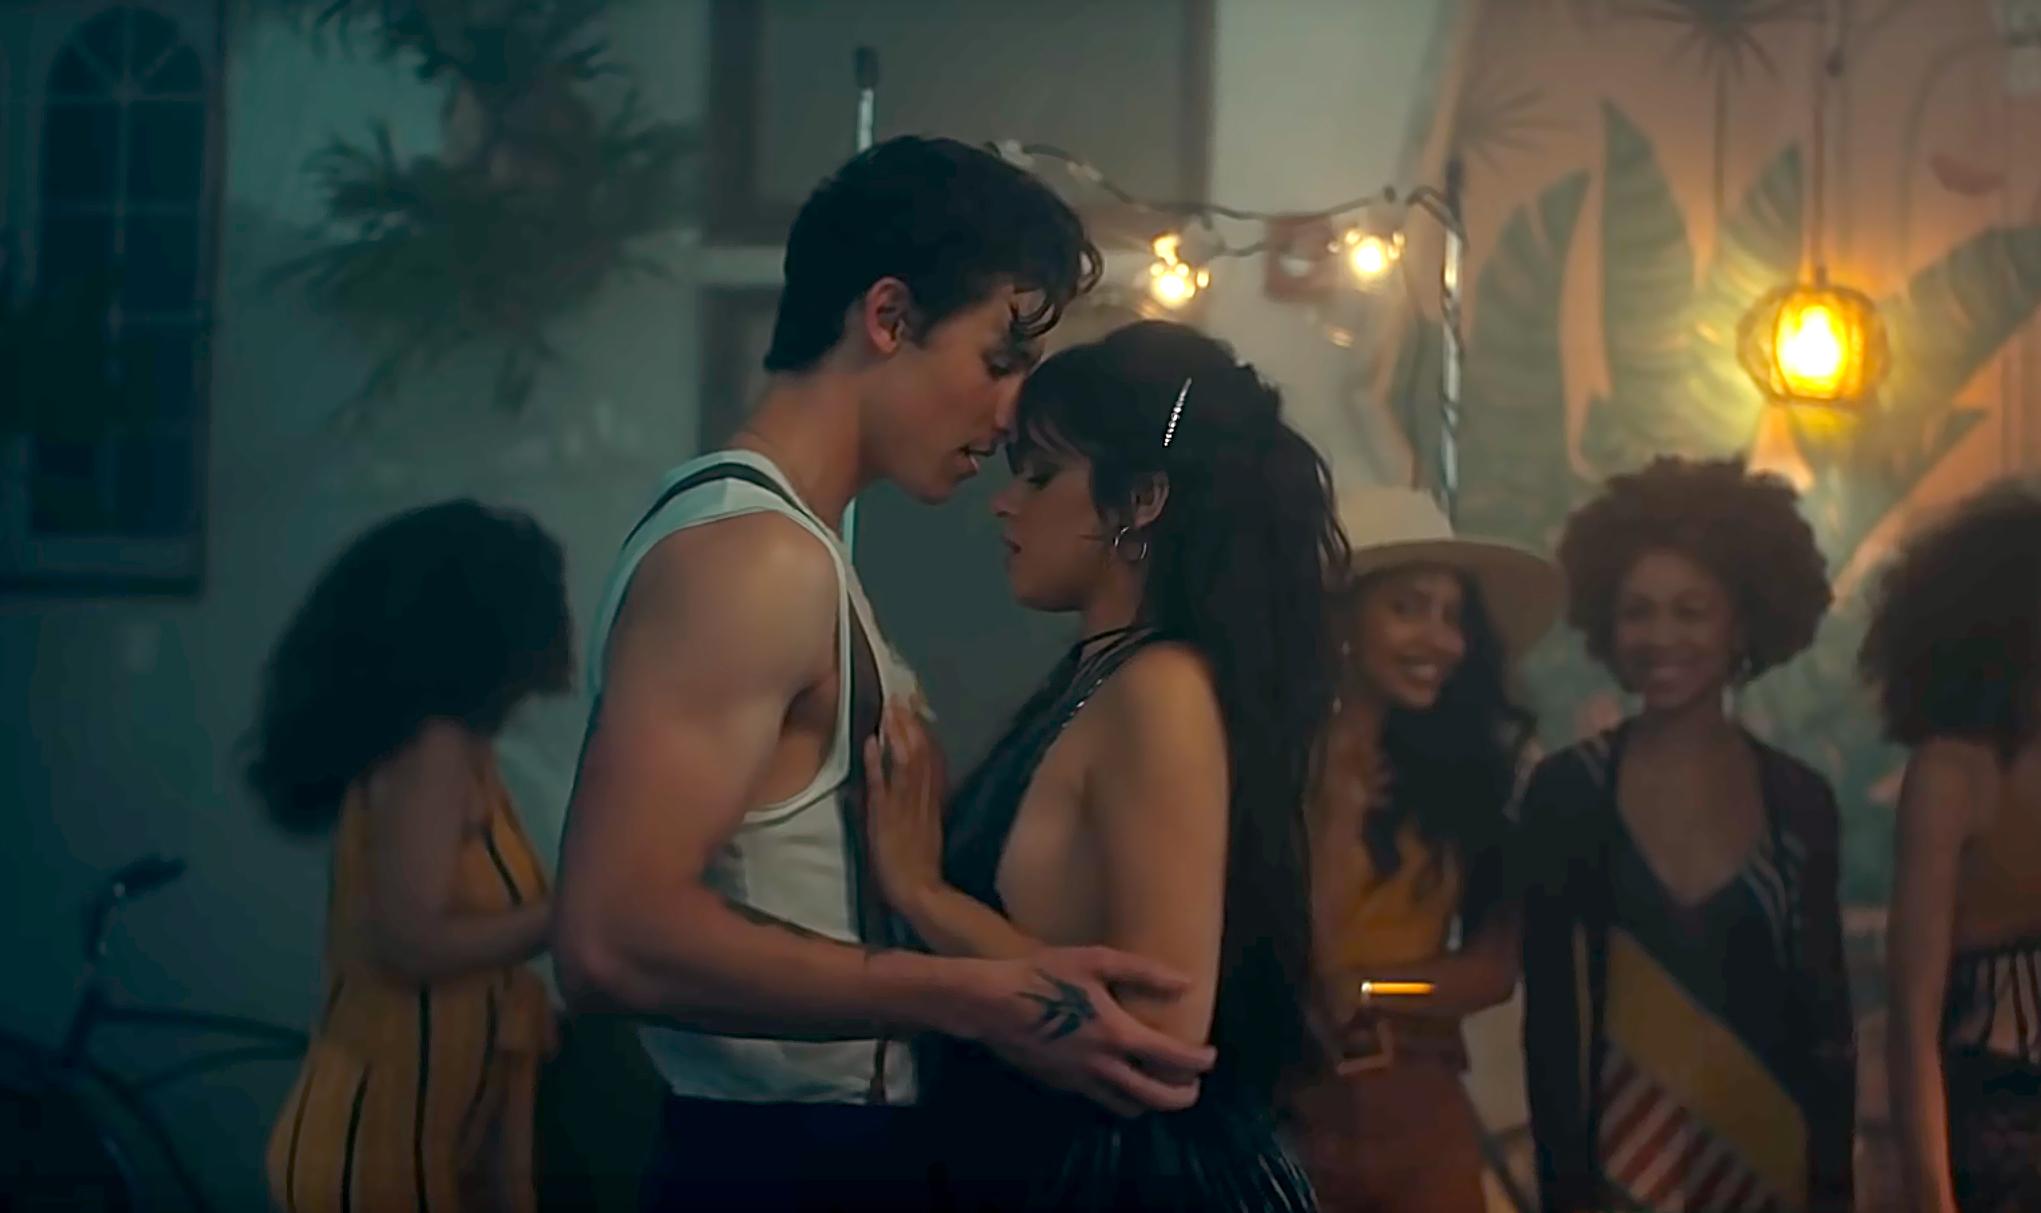 Shawn-Mendes-and-Camila-Cabello-Senorita.jpg